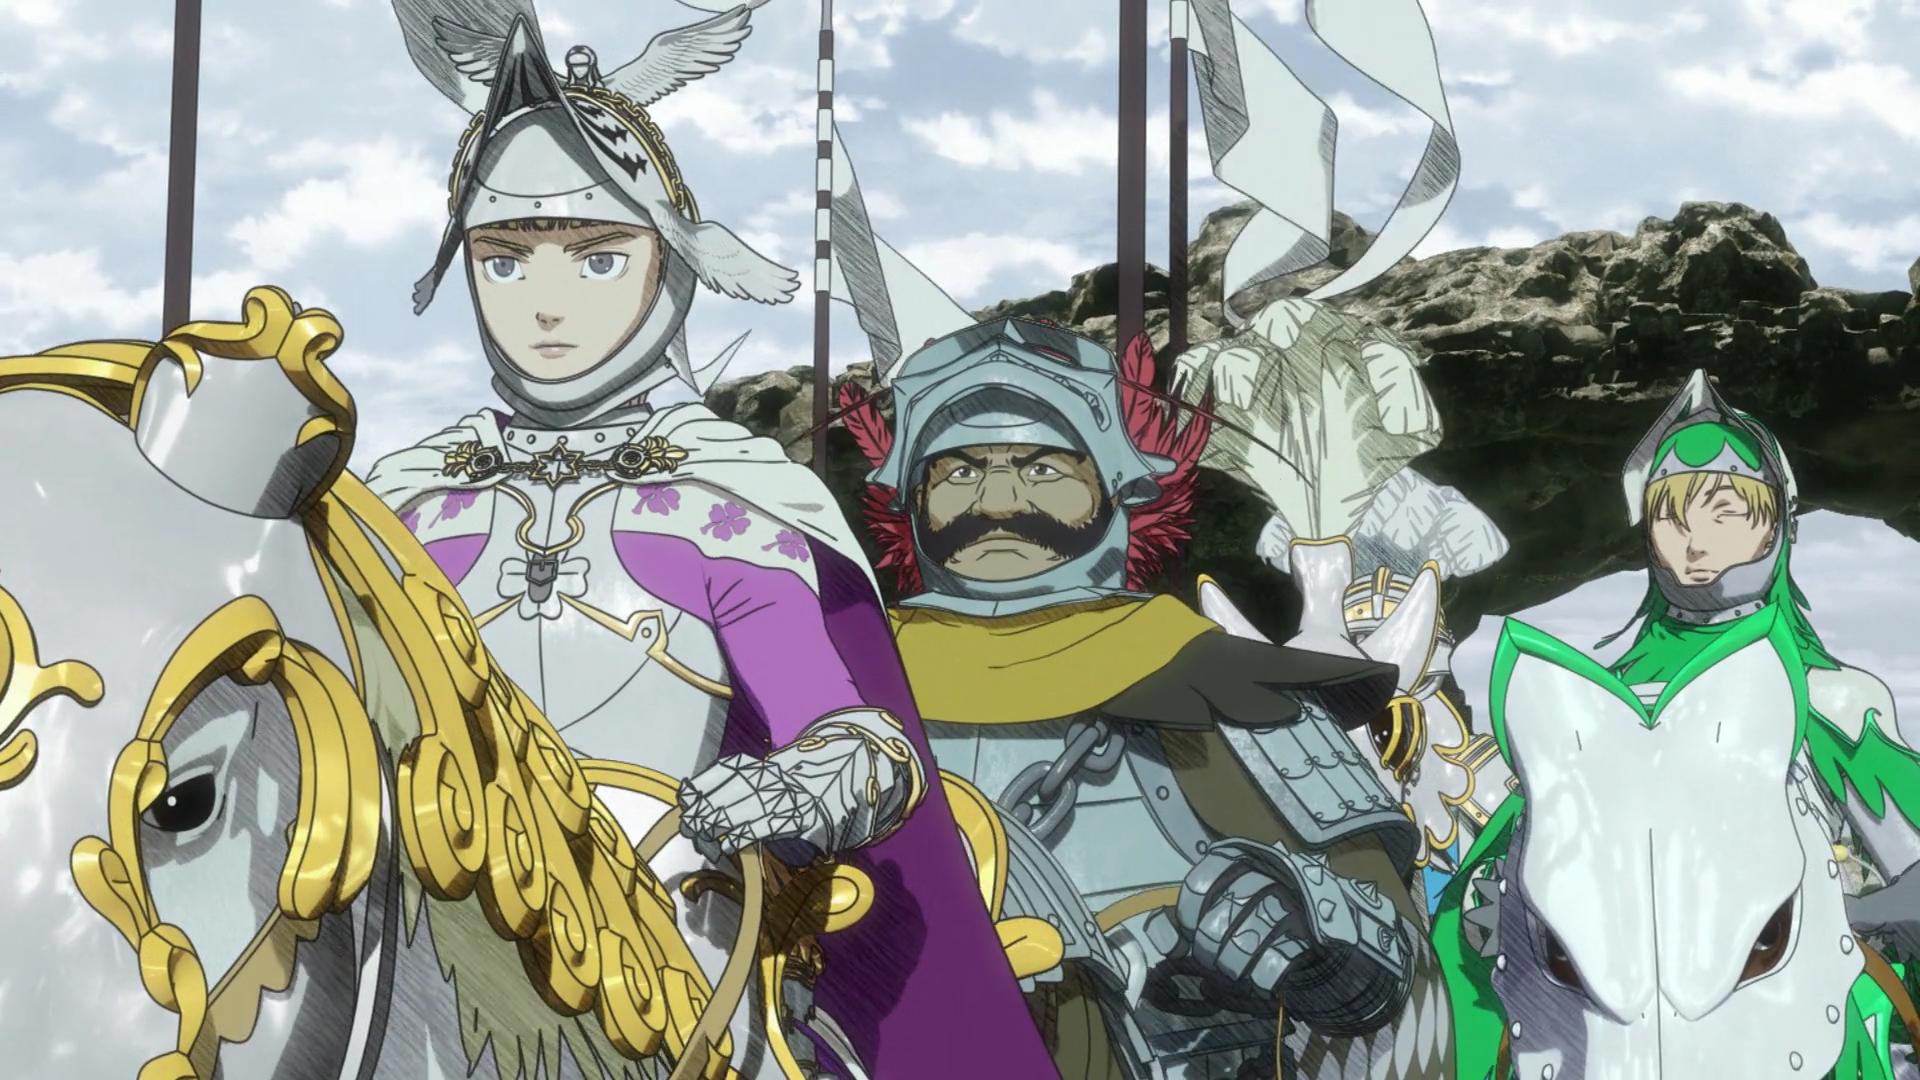 Download Berserker Anime Viking Wallpapers